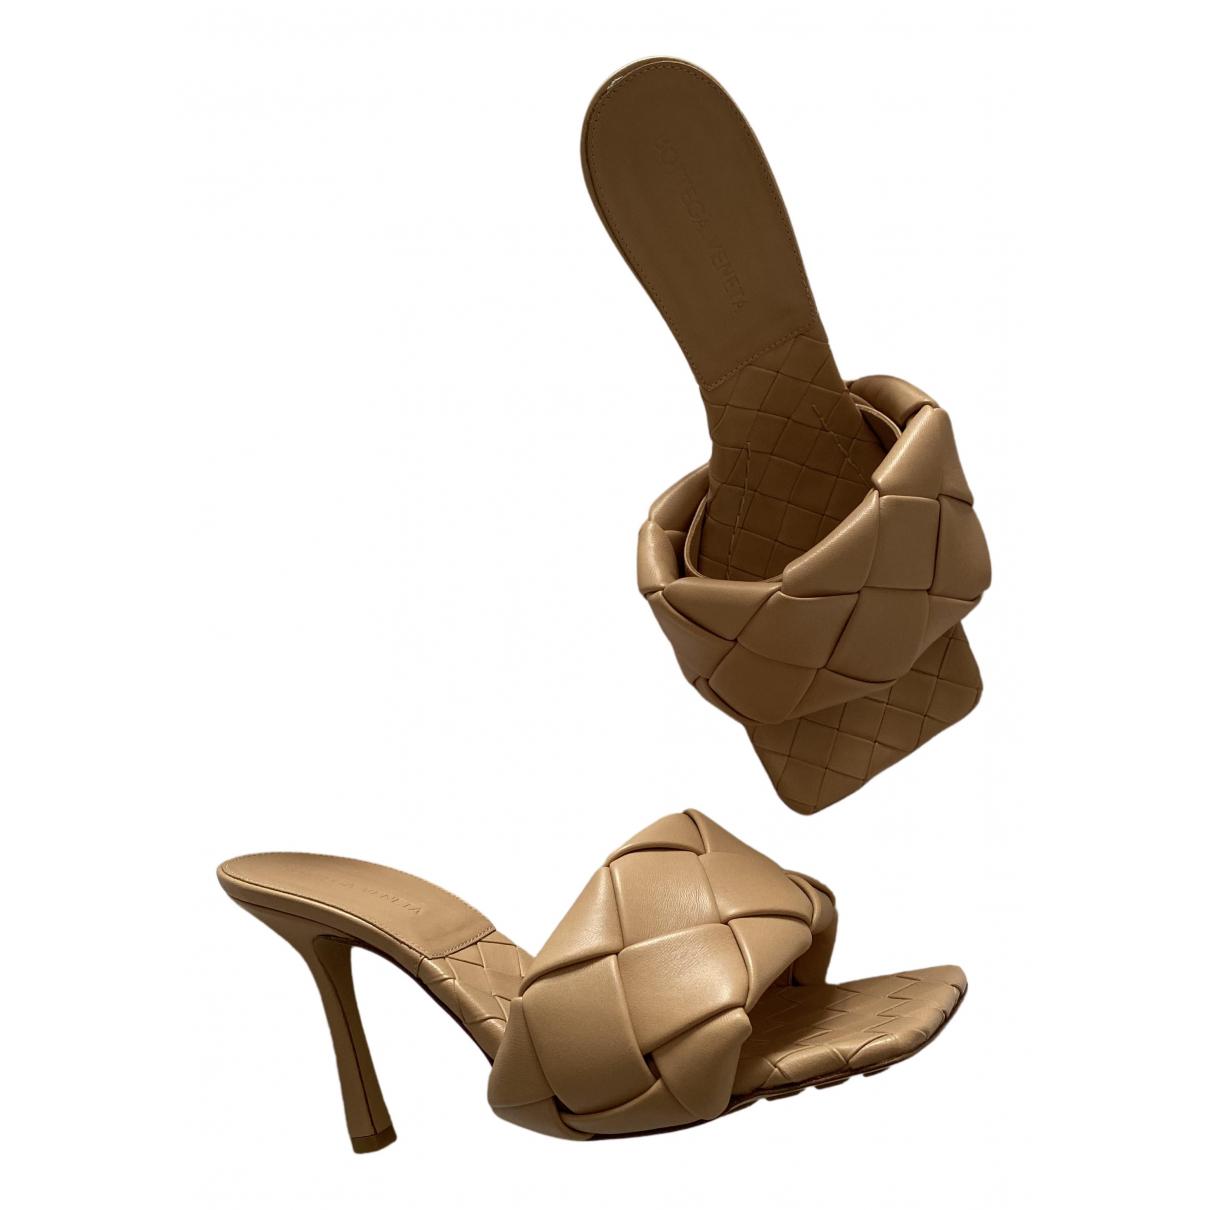 Bottega Veneta - Sandales Padded pour femme en cuir - beige